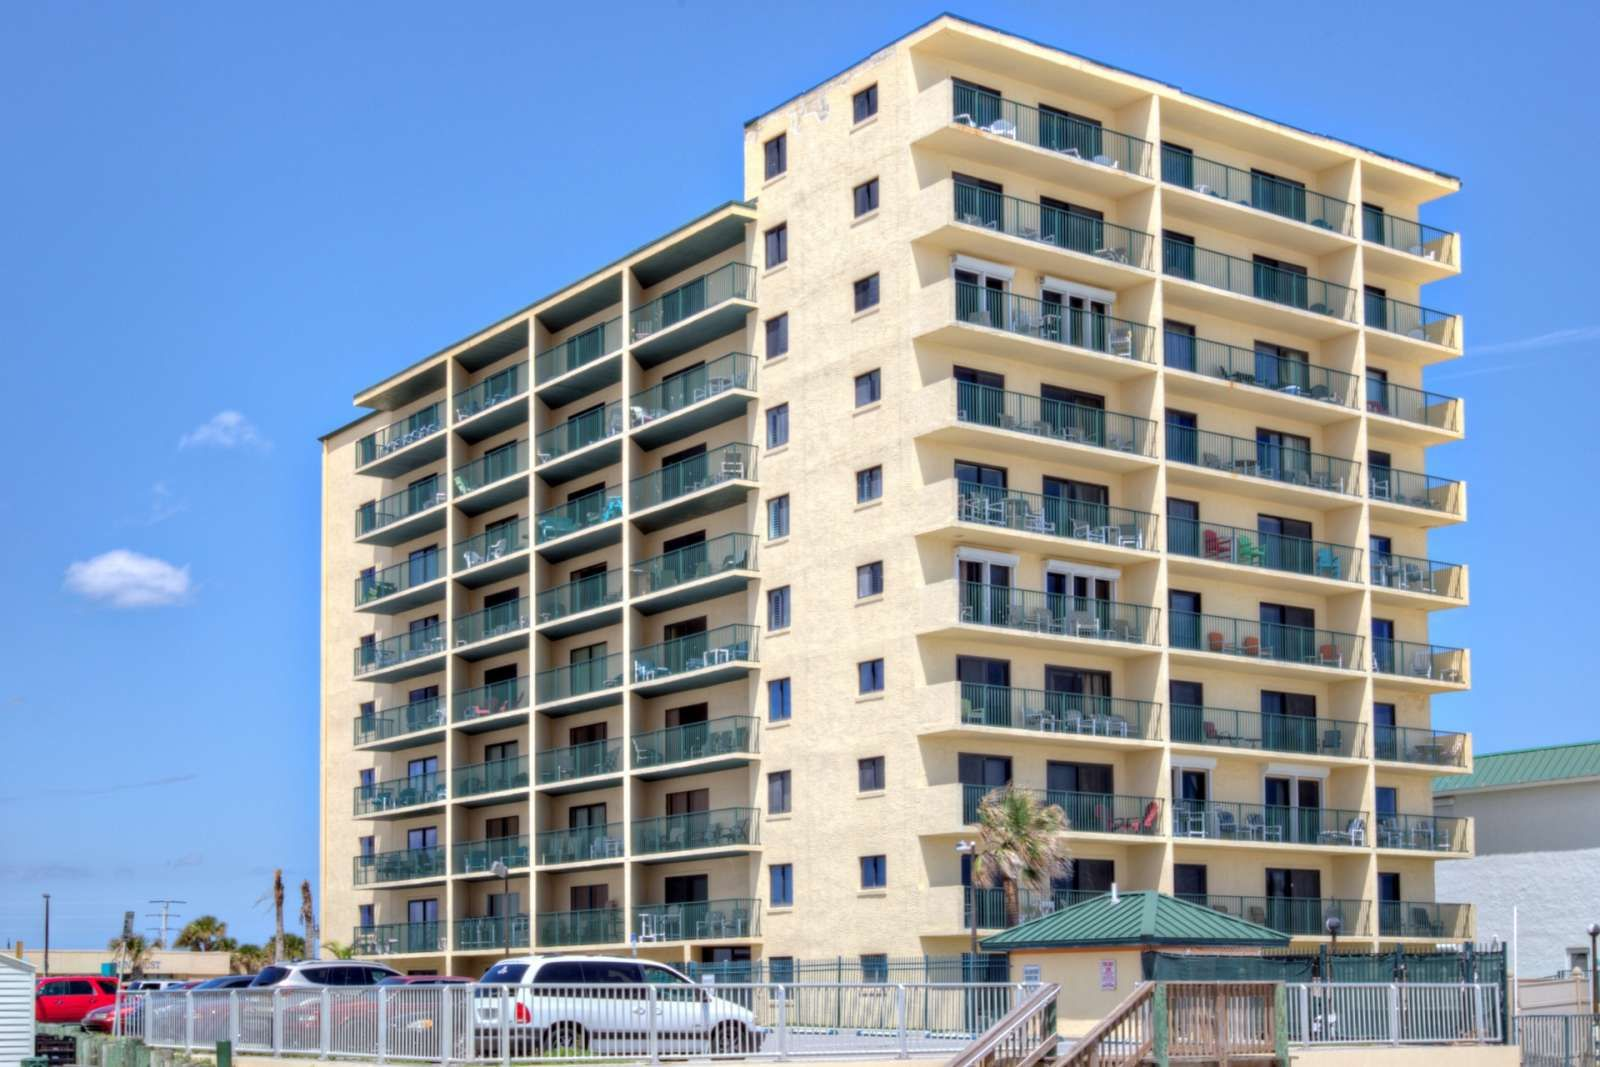 Daytona Beach Shores Vacation Rental Daytona Beach Shores Pool Hot Tub Vacation Rental